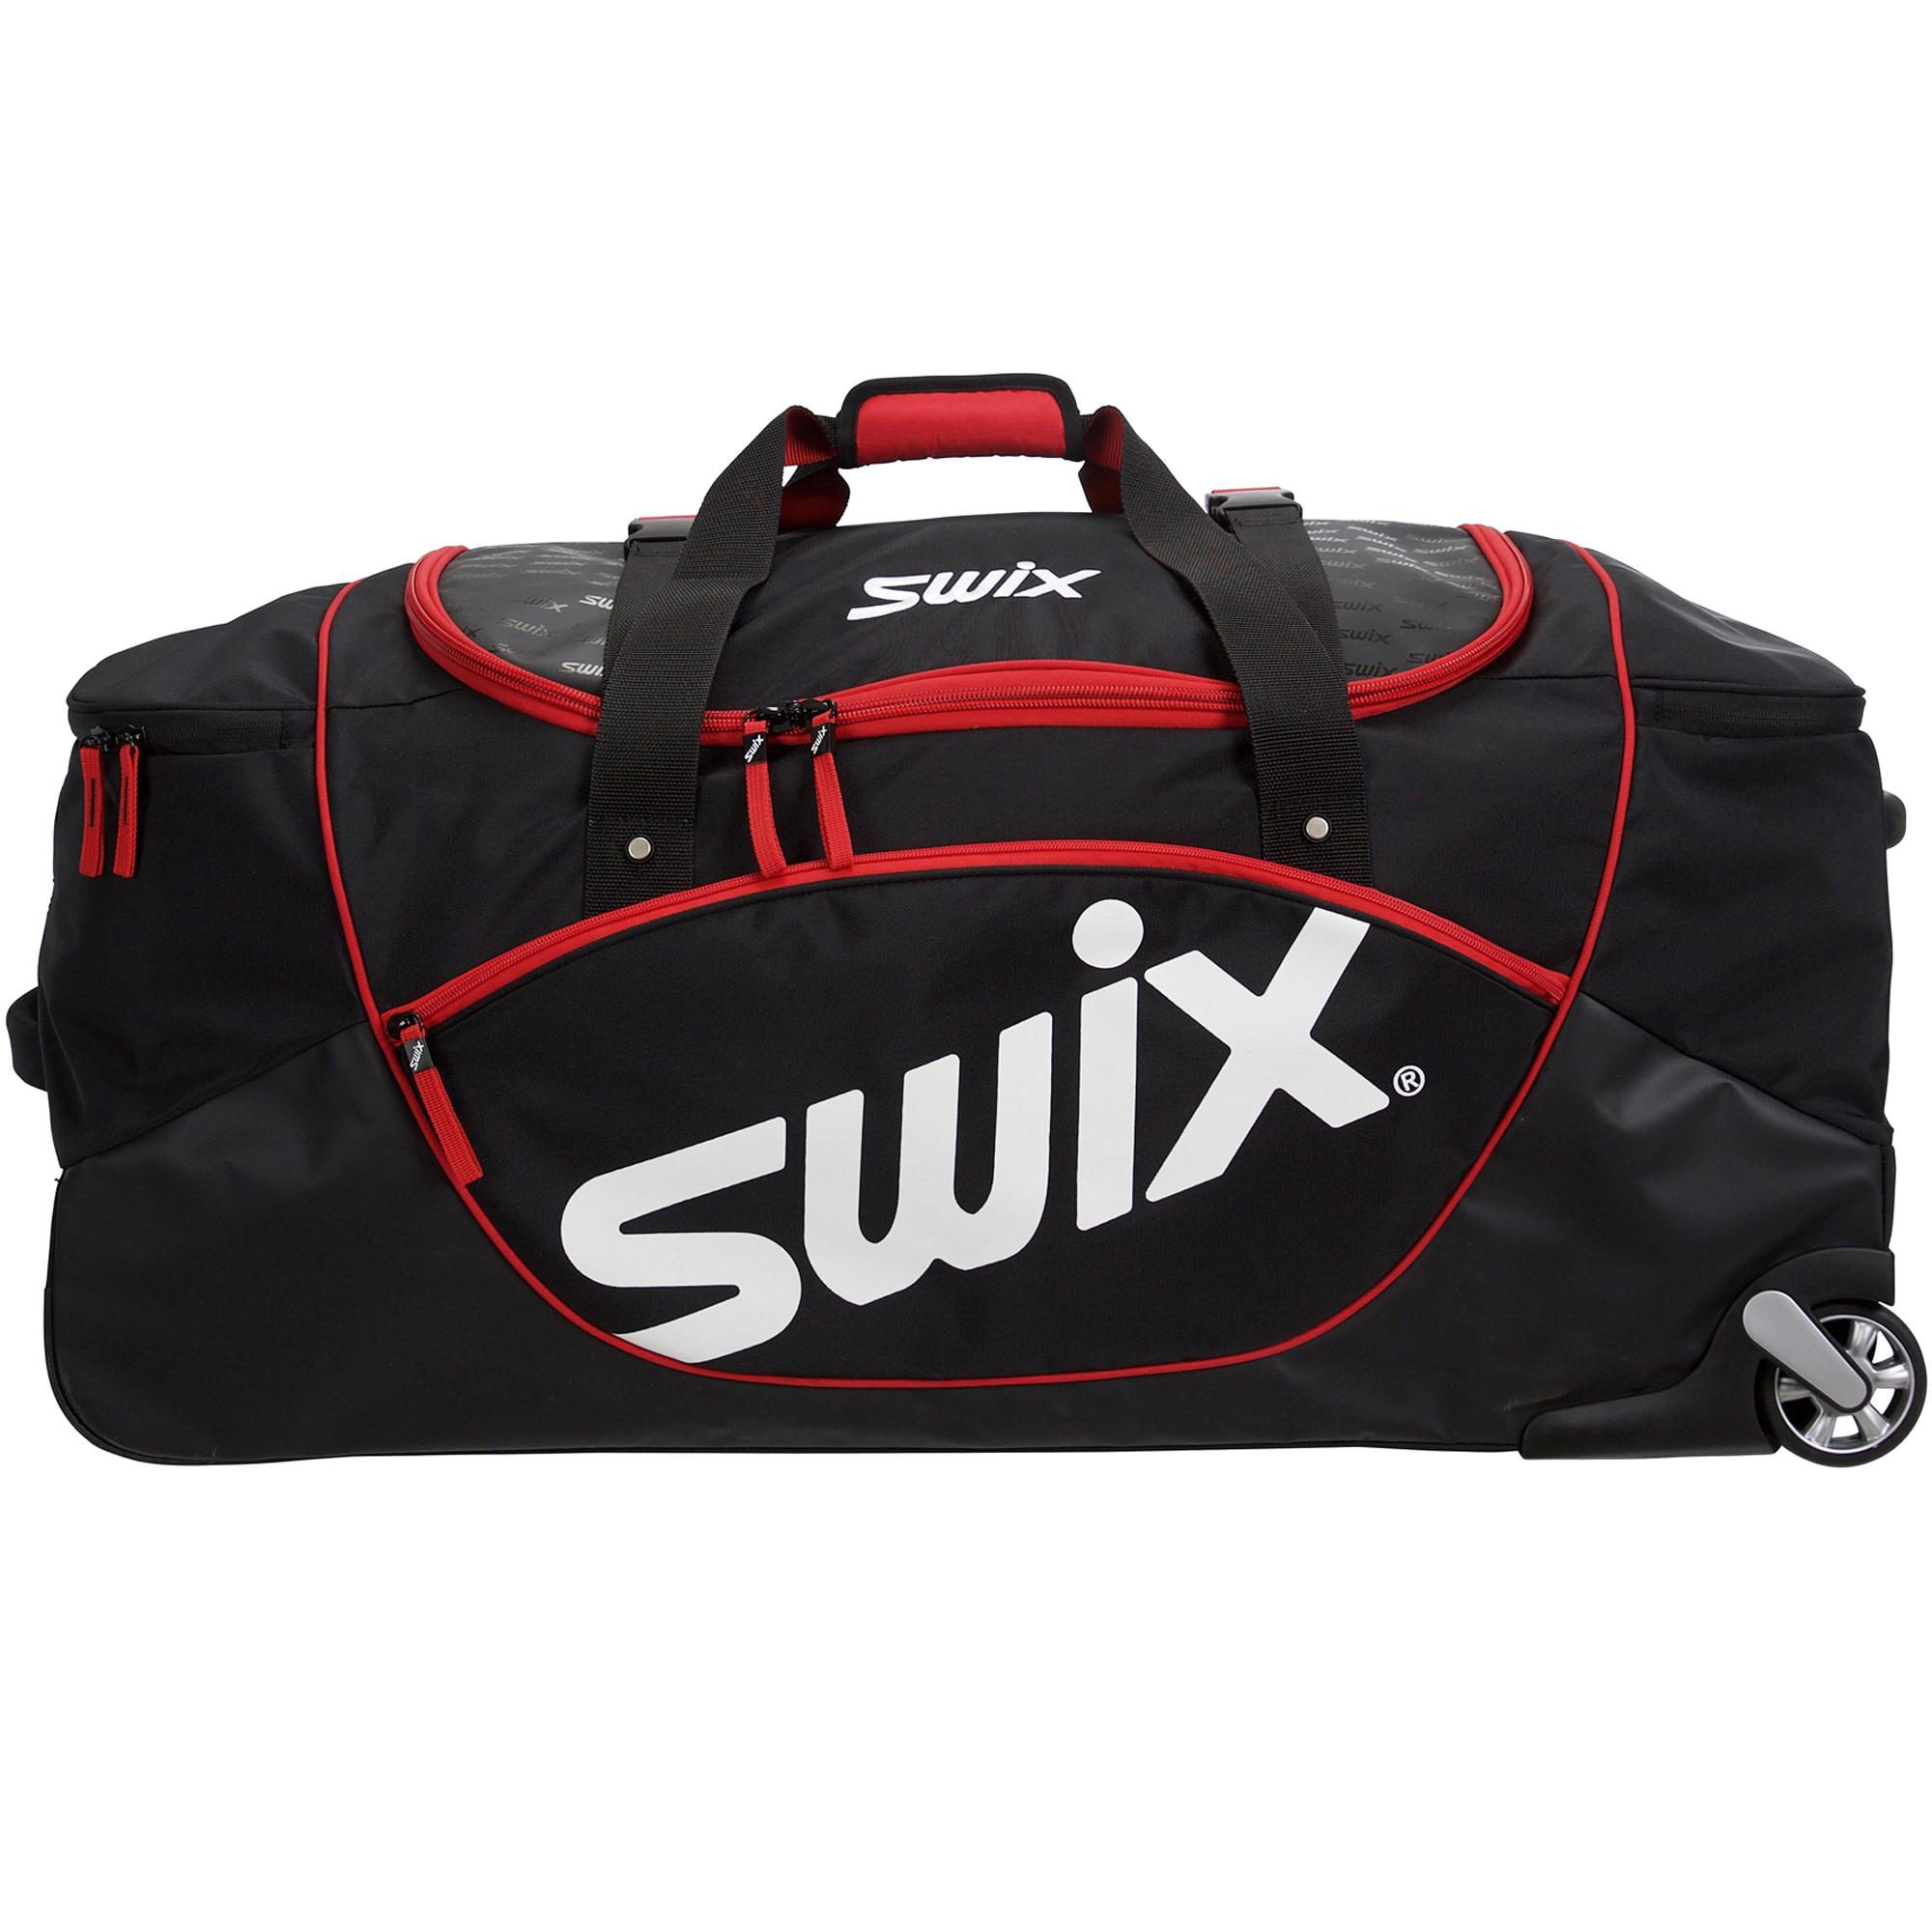 74f4413777 Packs   bags